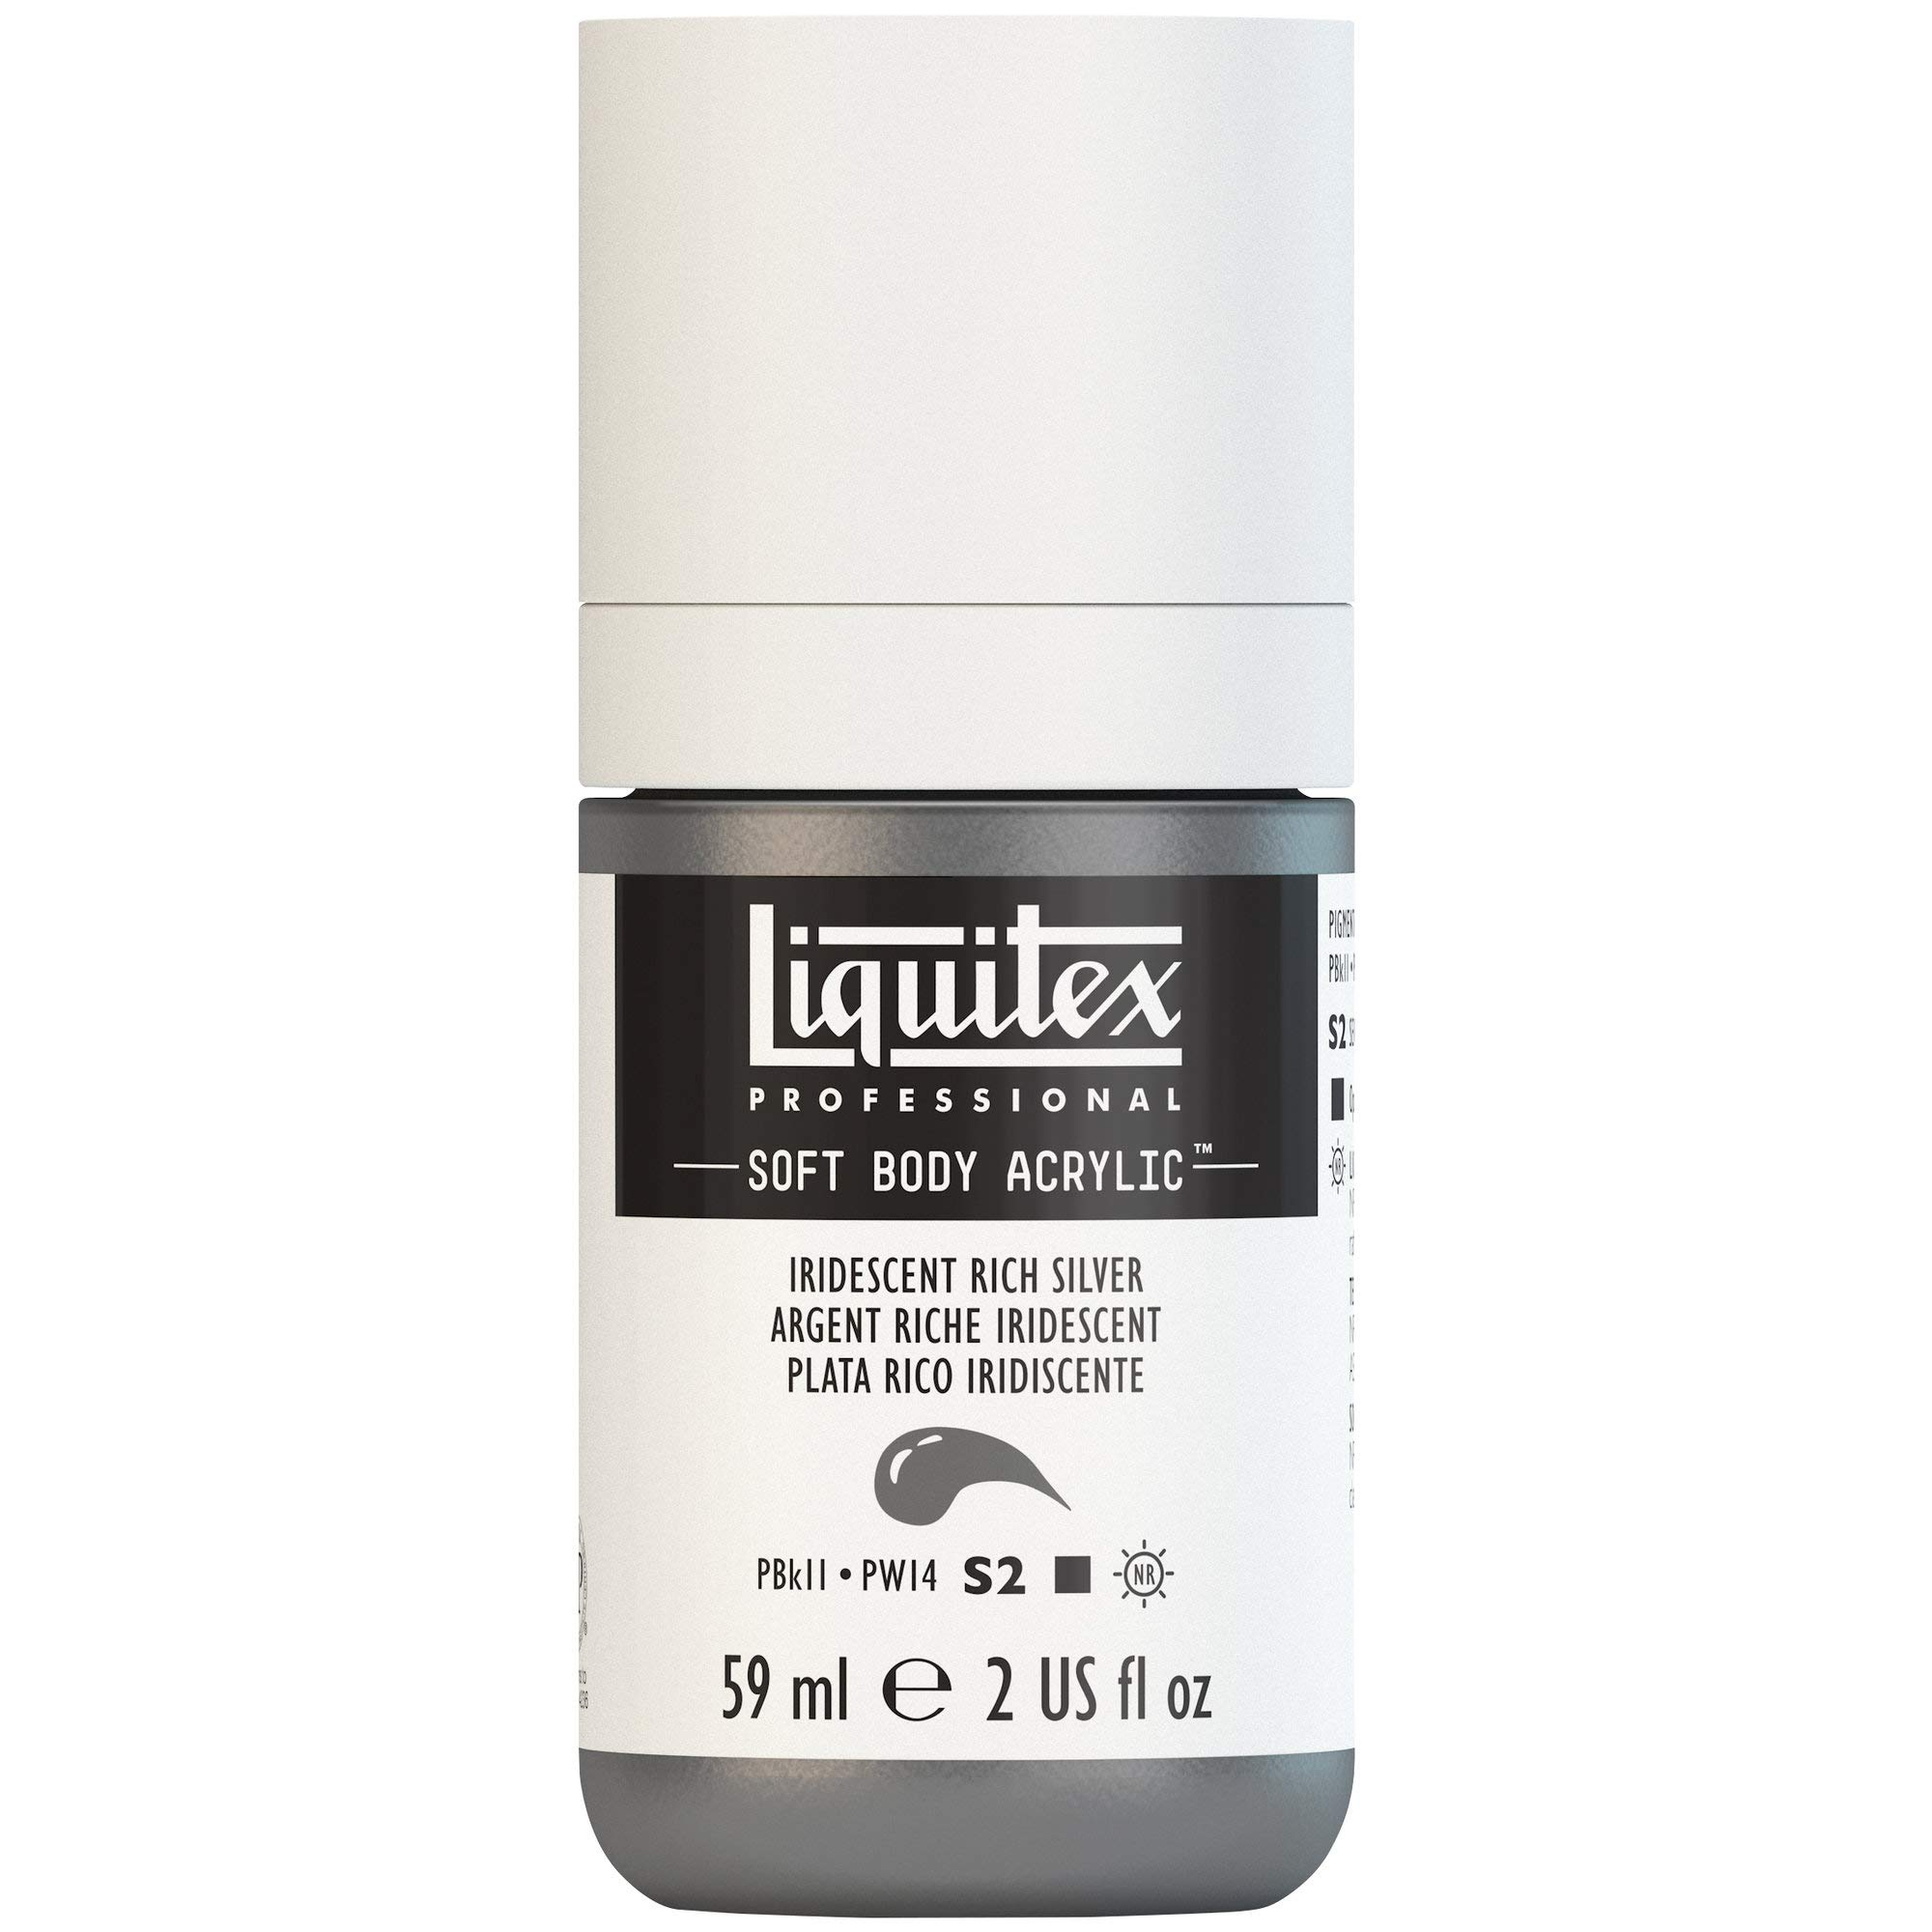 Liquitex Professional Soft Body Acrylic Paint 2-oz bottle, Iridescent Rich Silver